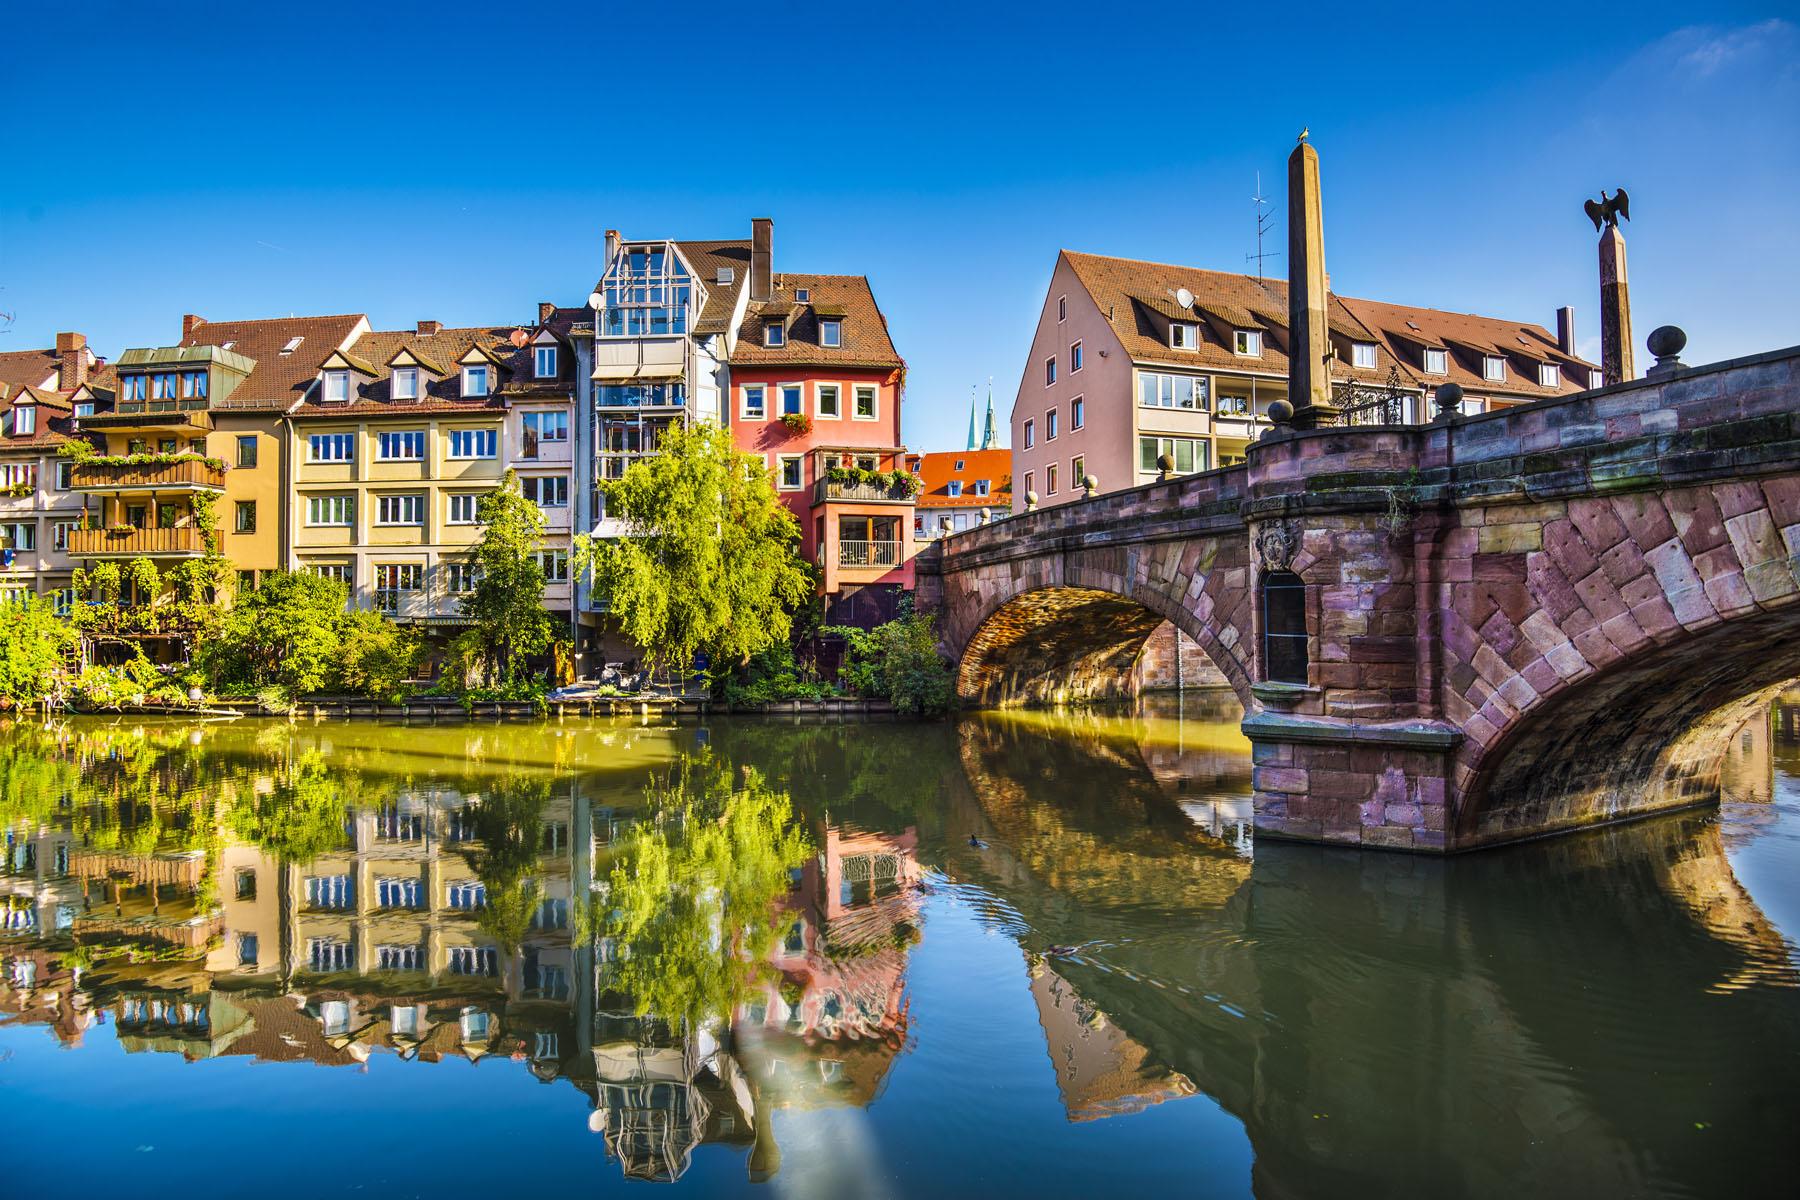 Germany-Nuremberg-Pegnitz River_168736211